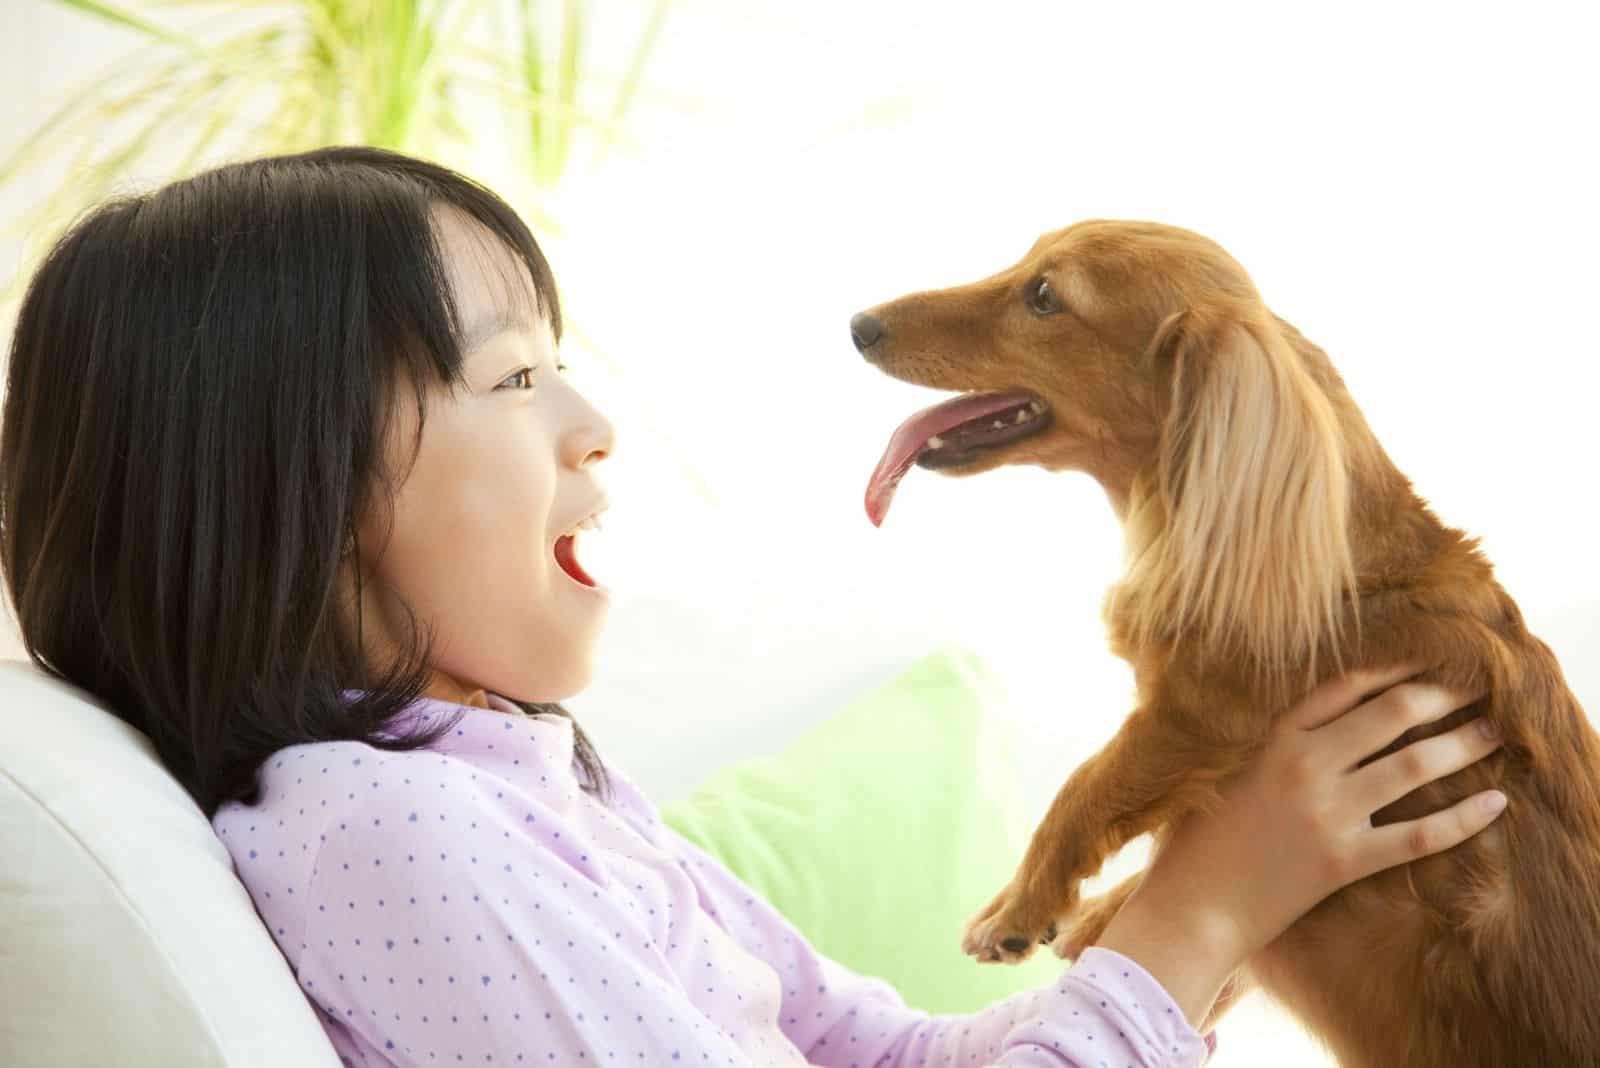 smiling girl hugging a miniature dachshund